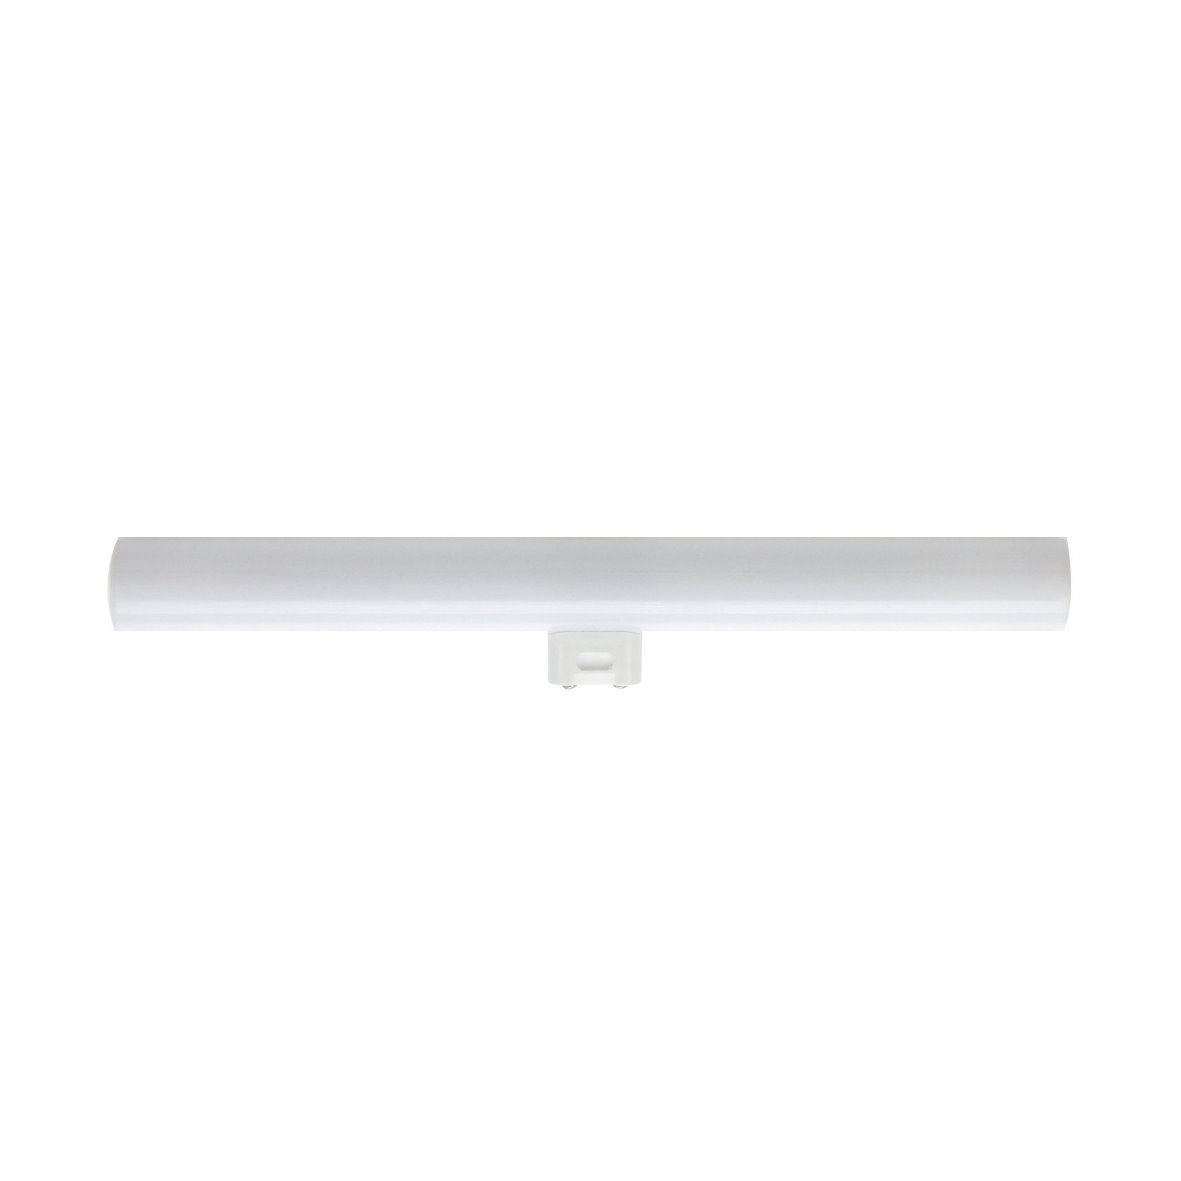 led smd lichtleiste linienlampe lampe licht leiste leuchte aufbau s14d s14s s14 ebay. Black Bedroom Furniture Sets. Home Design Ideas